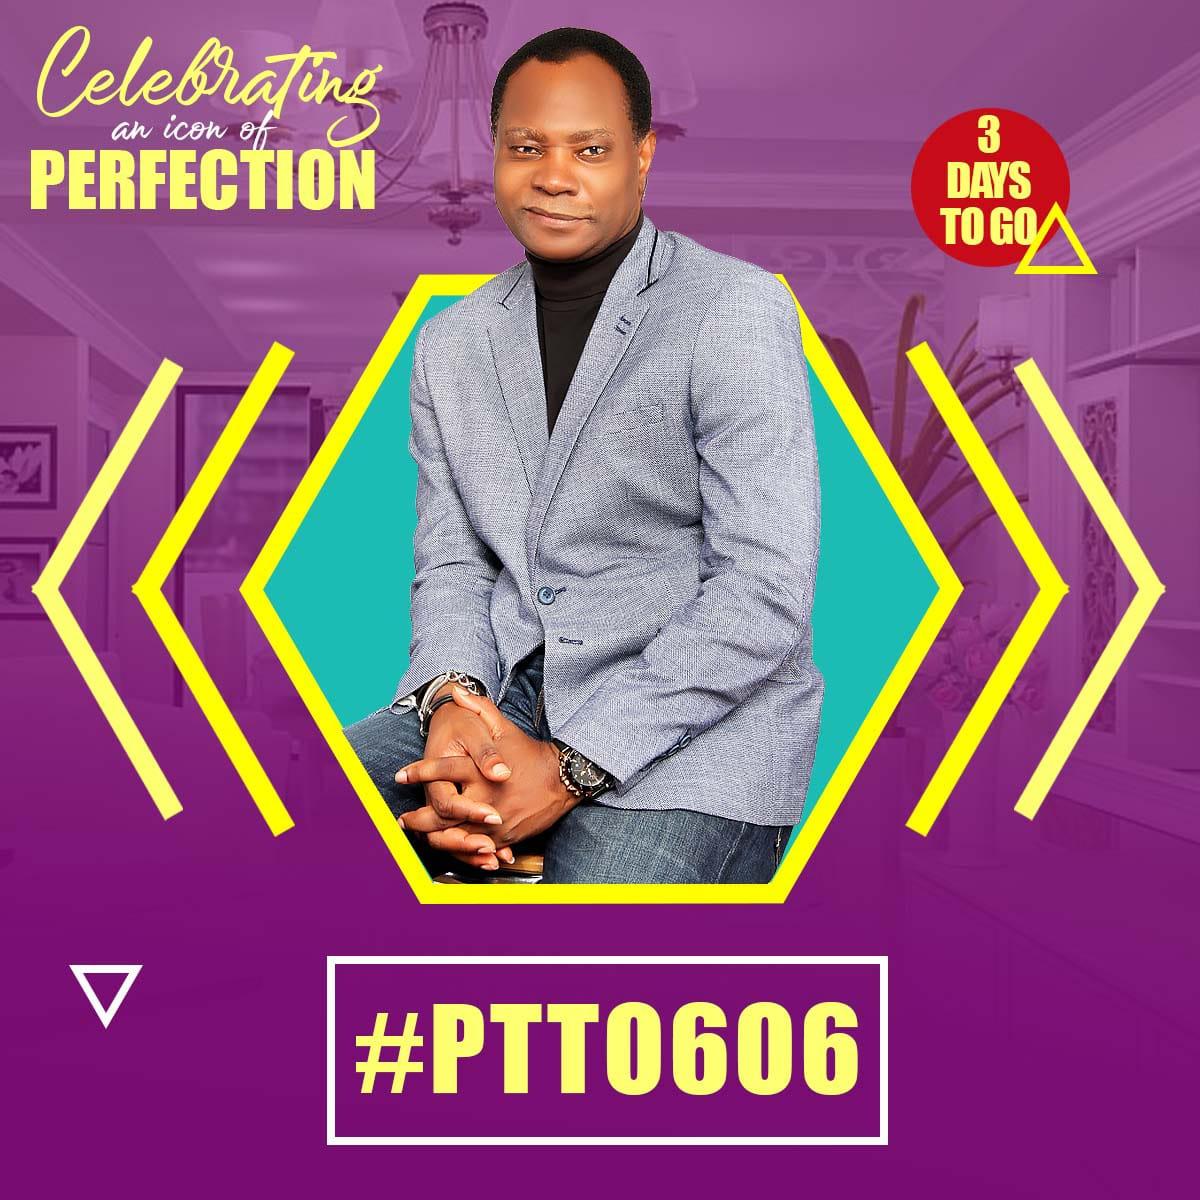 PTT06 #June6th #CelebratingExcellence #GracePerson